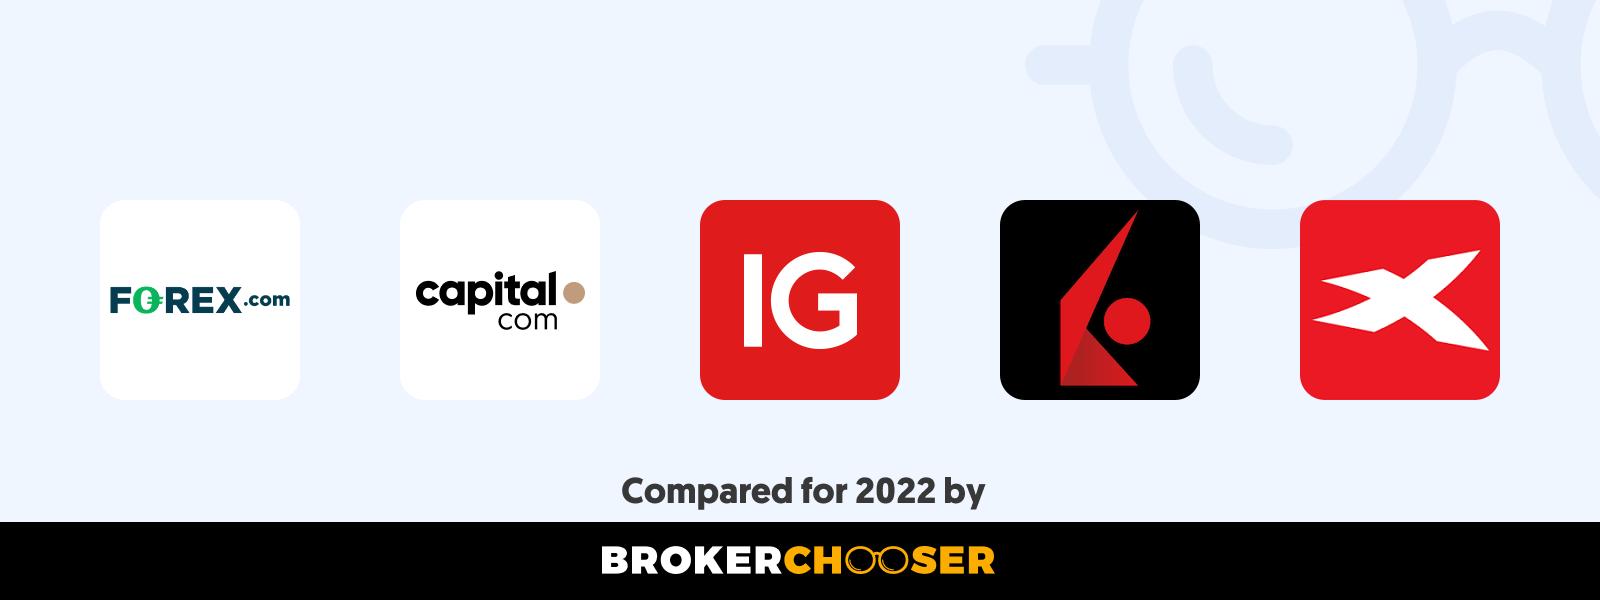 Best forex brokers for beginners in Botswana in 2021